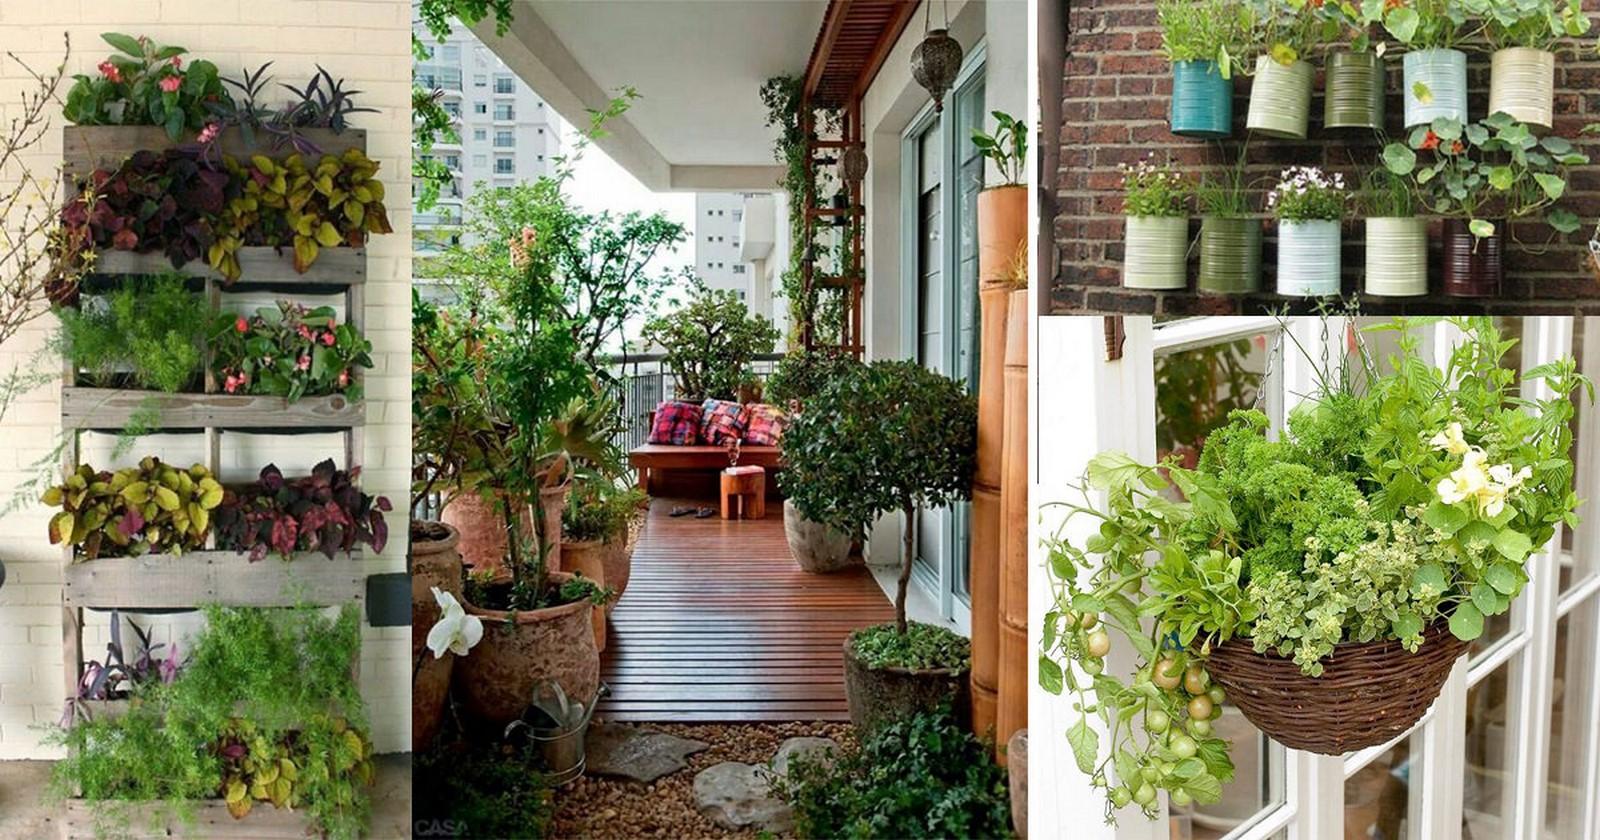 How to create Balcony Gardens - Sheet3